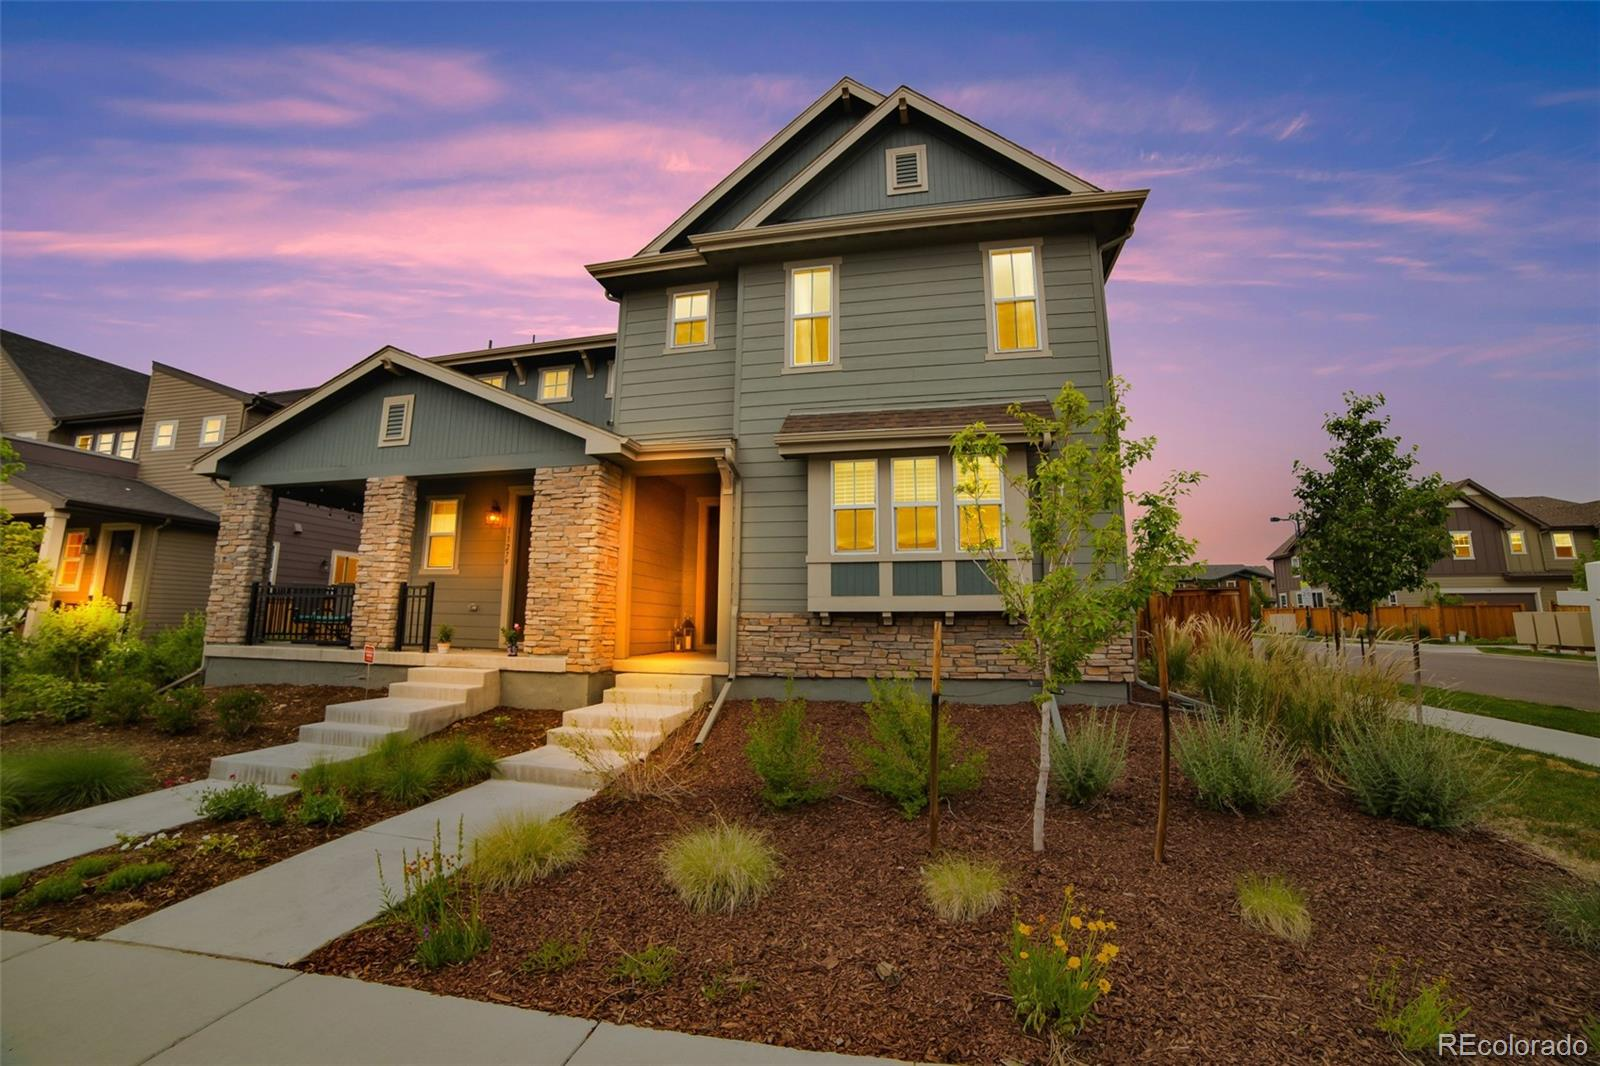 11299 E 25th Drive Property Photo - Aurora, CO real estate listing